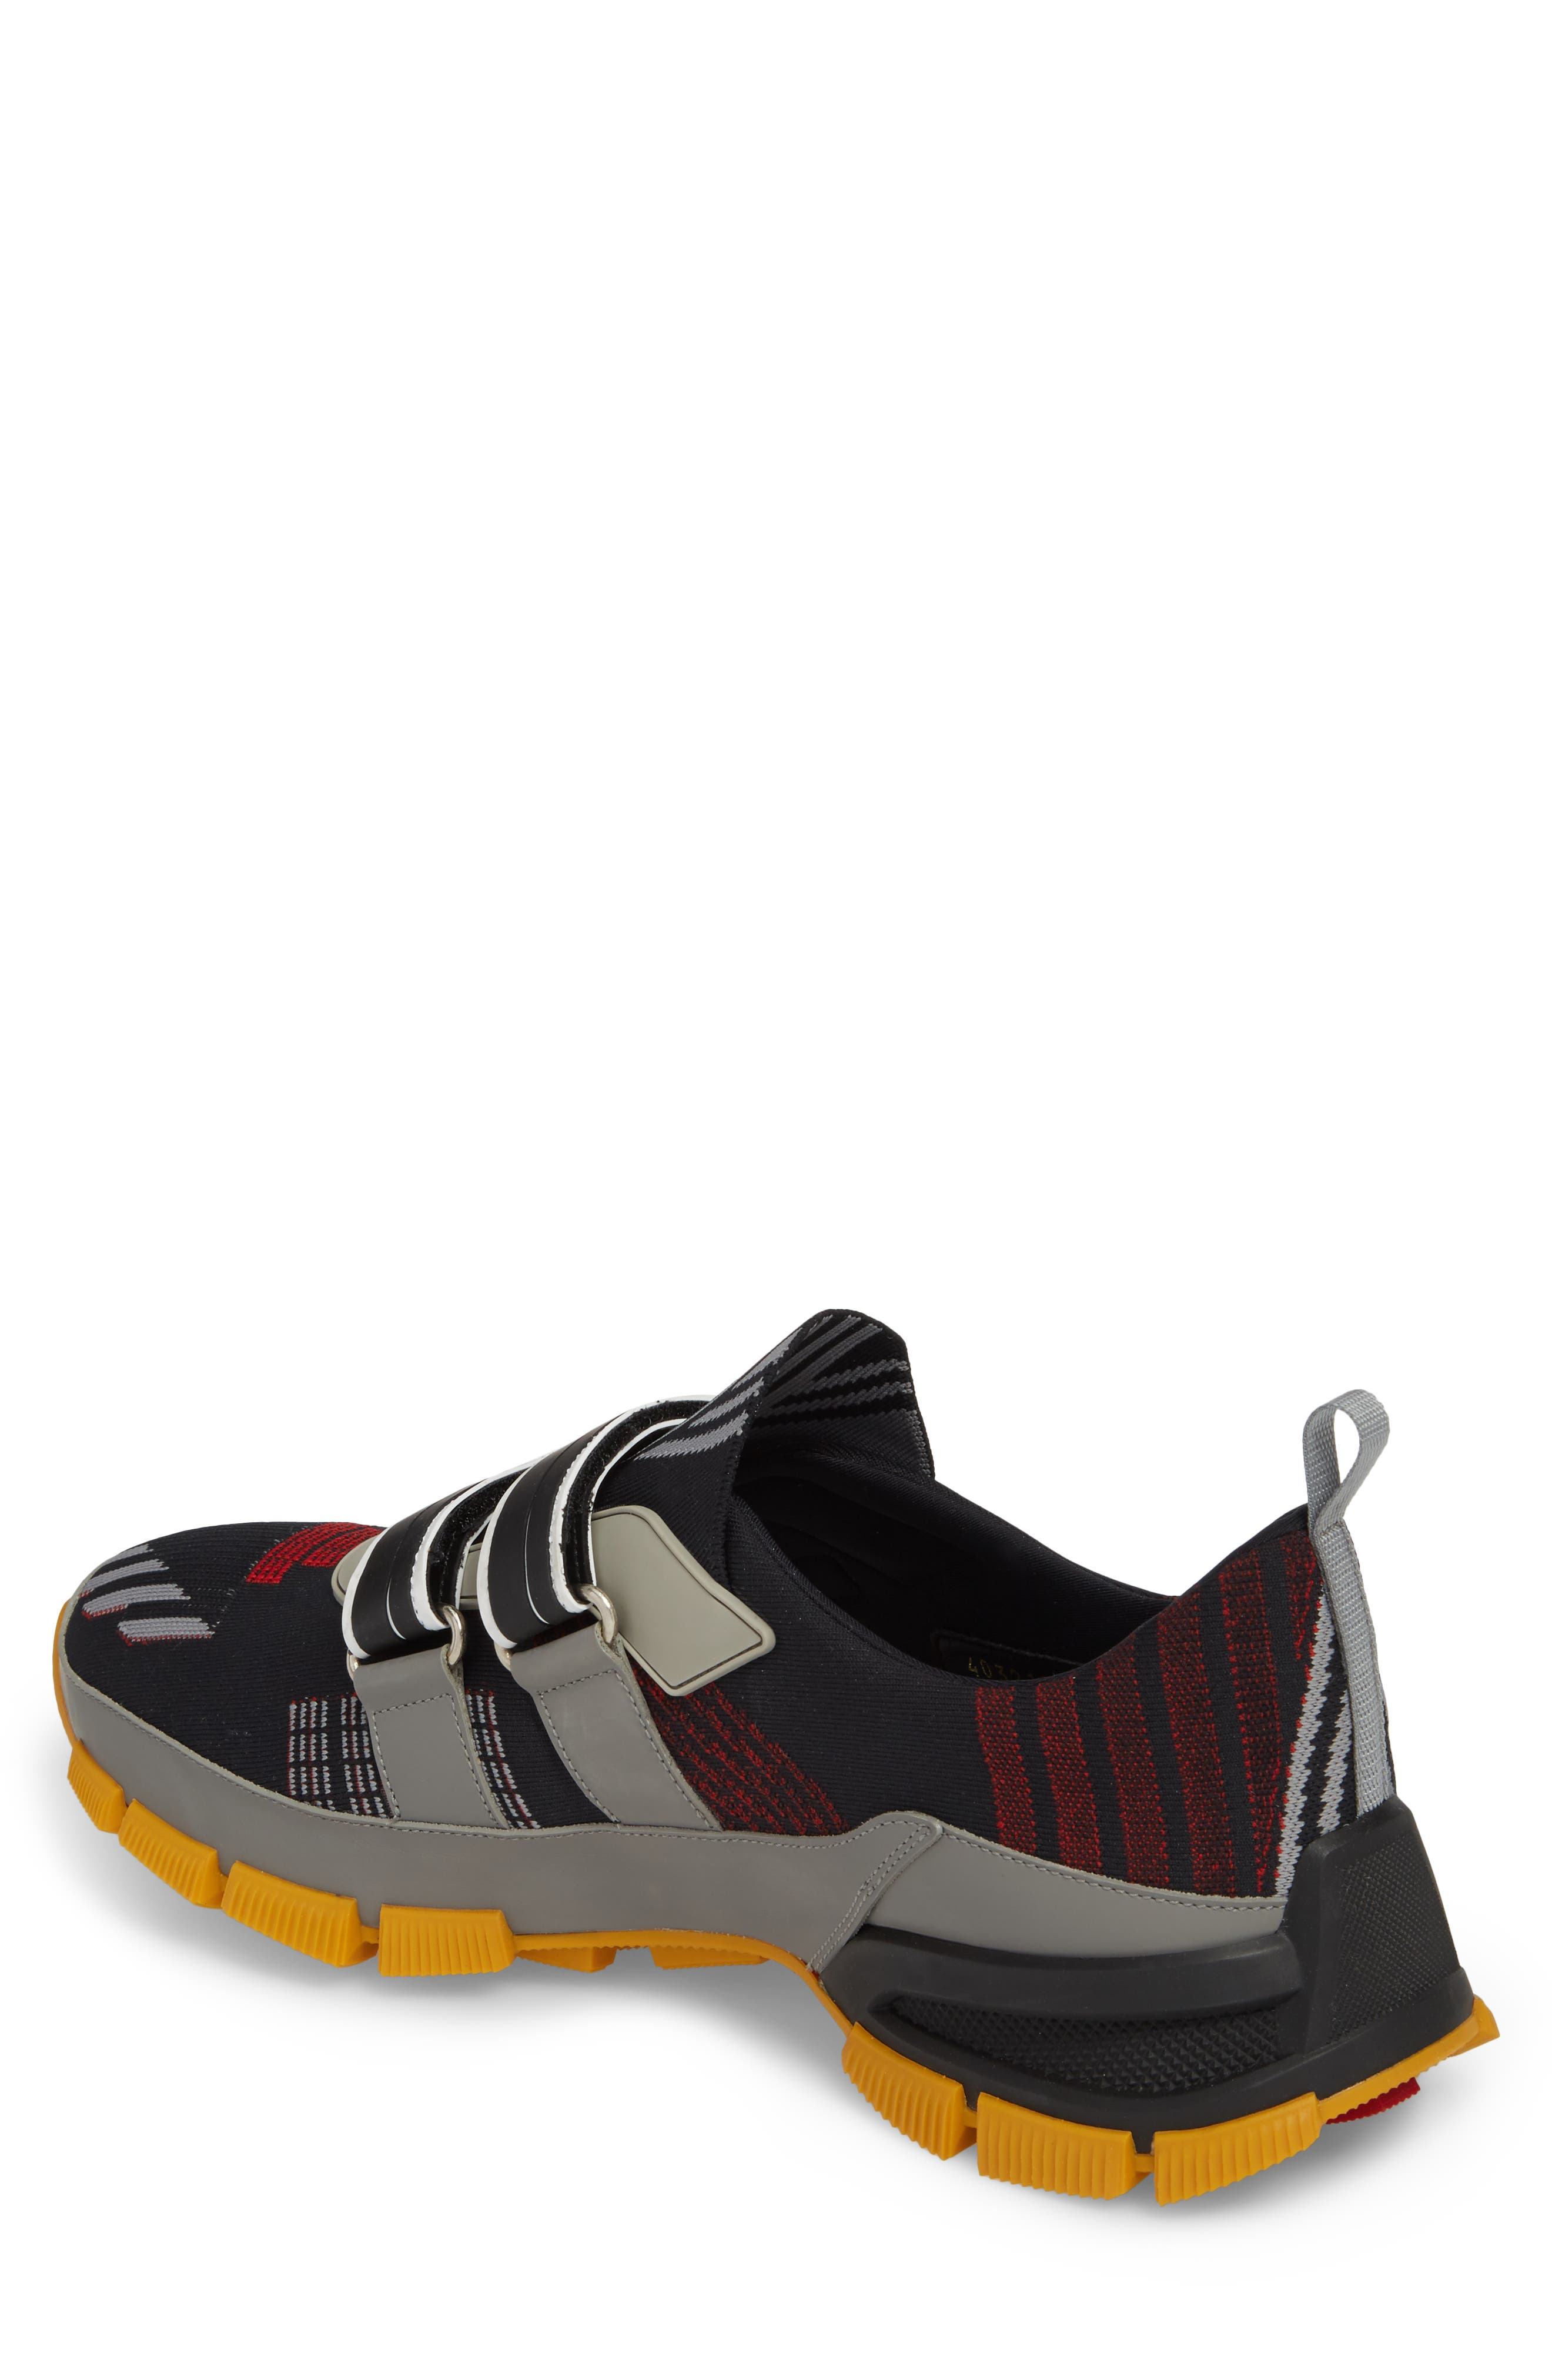 Linea Rossa Strap Sneaker,                             Alternate thumbnail 2, color,                             001